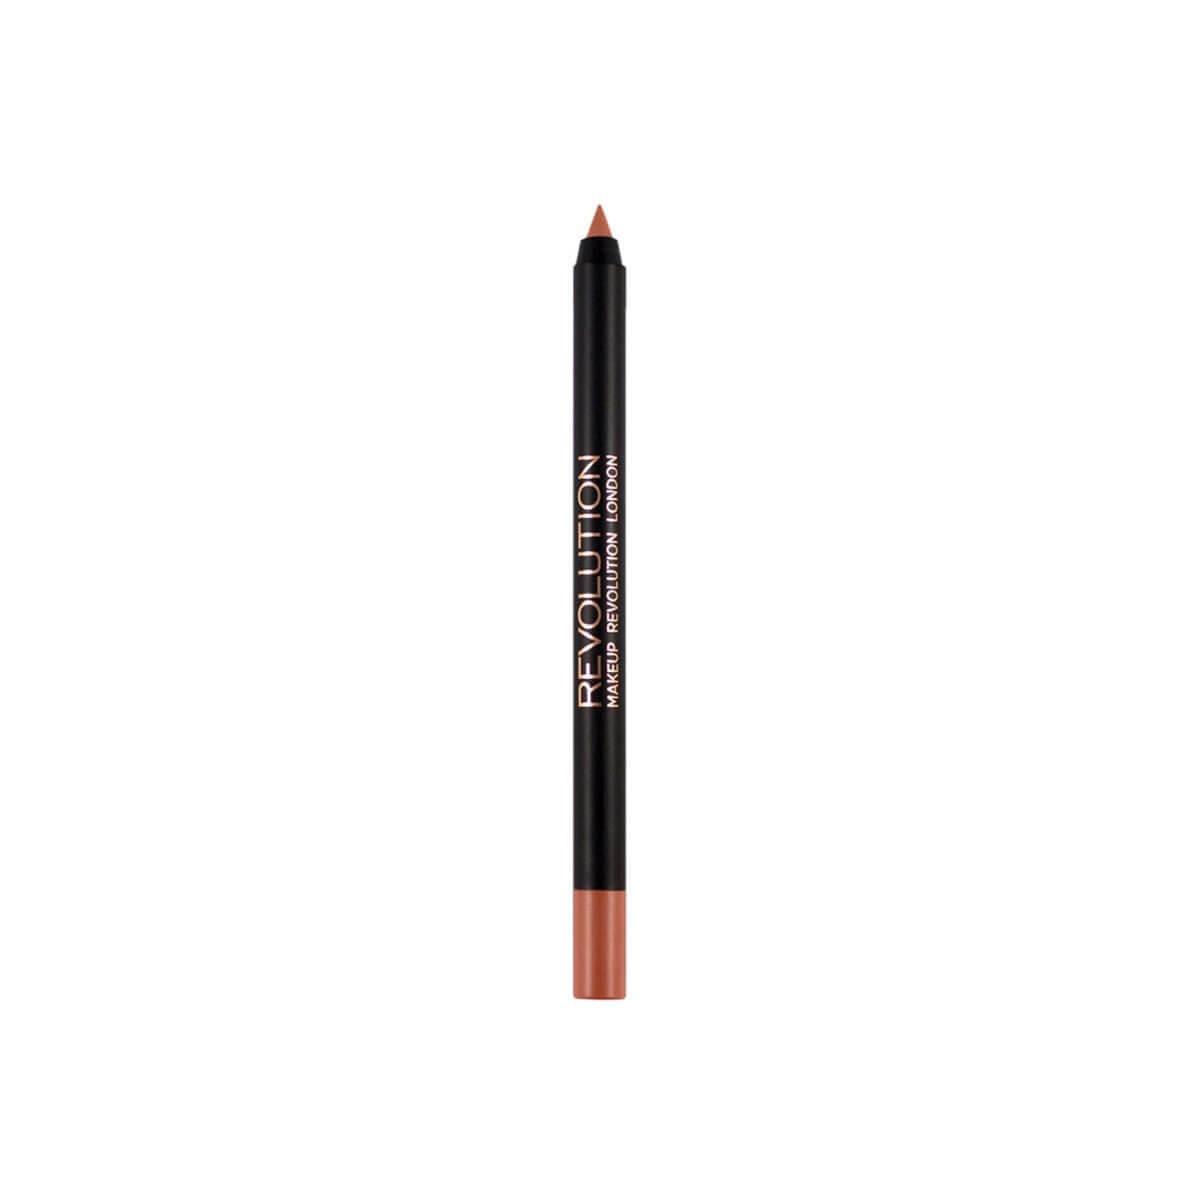 Retro Luxe Matte Lip Kit Peach Charming